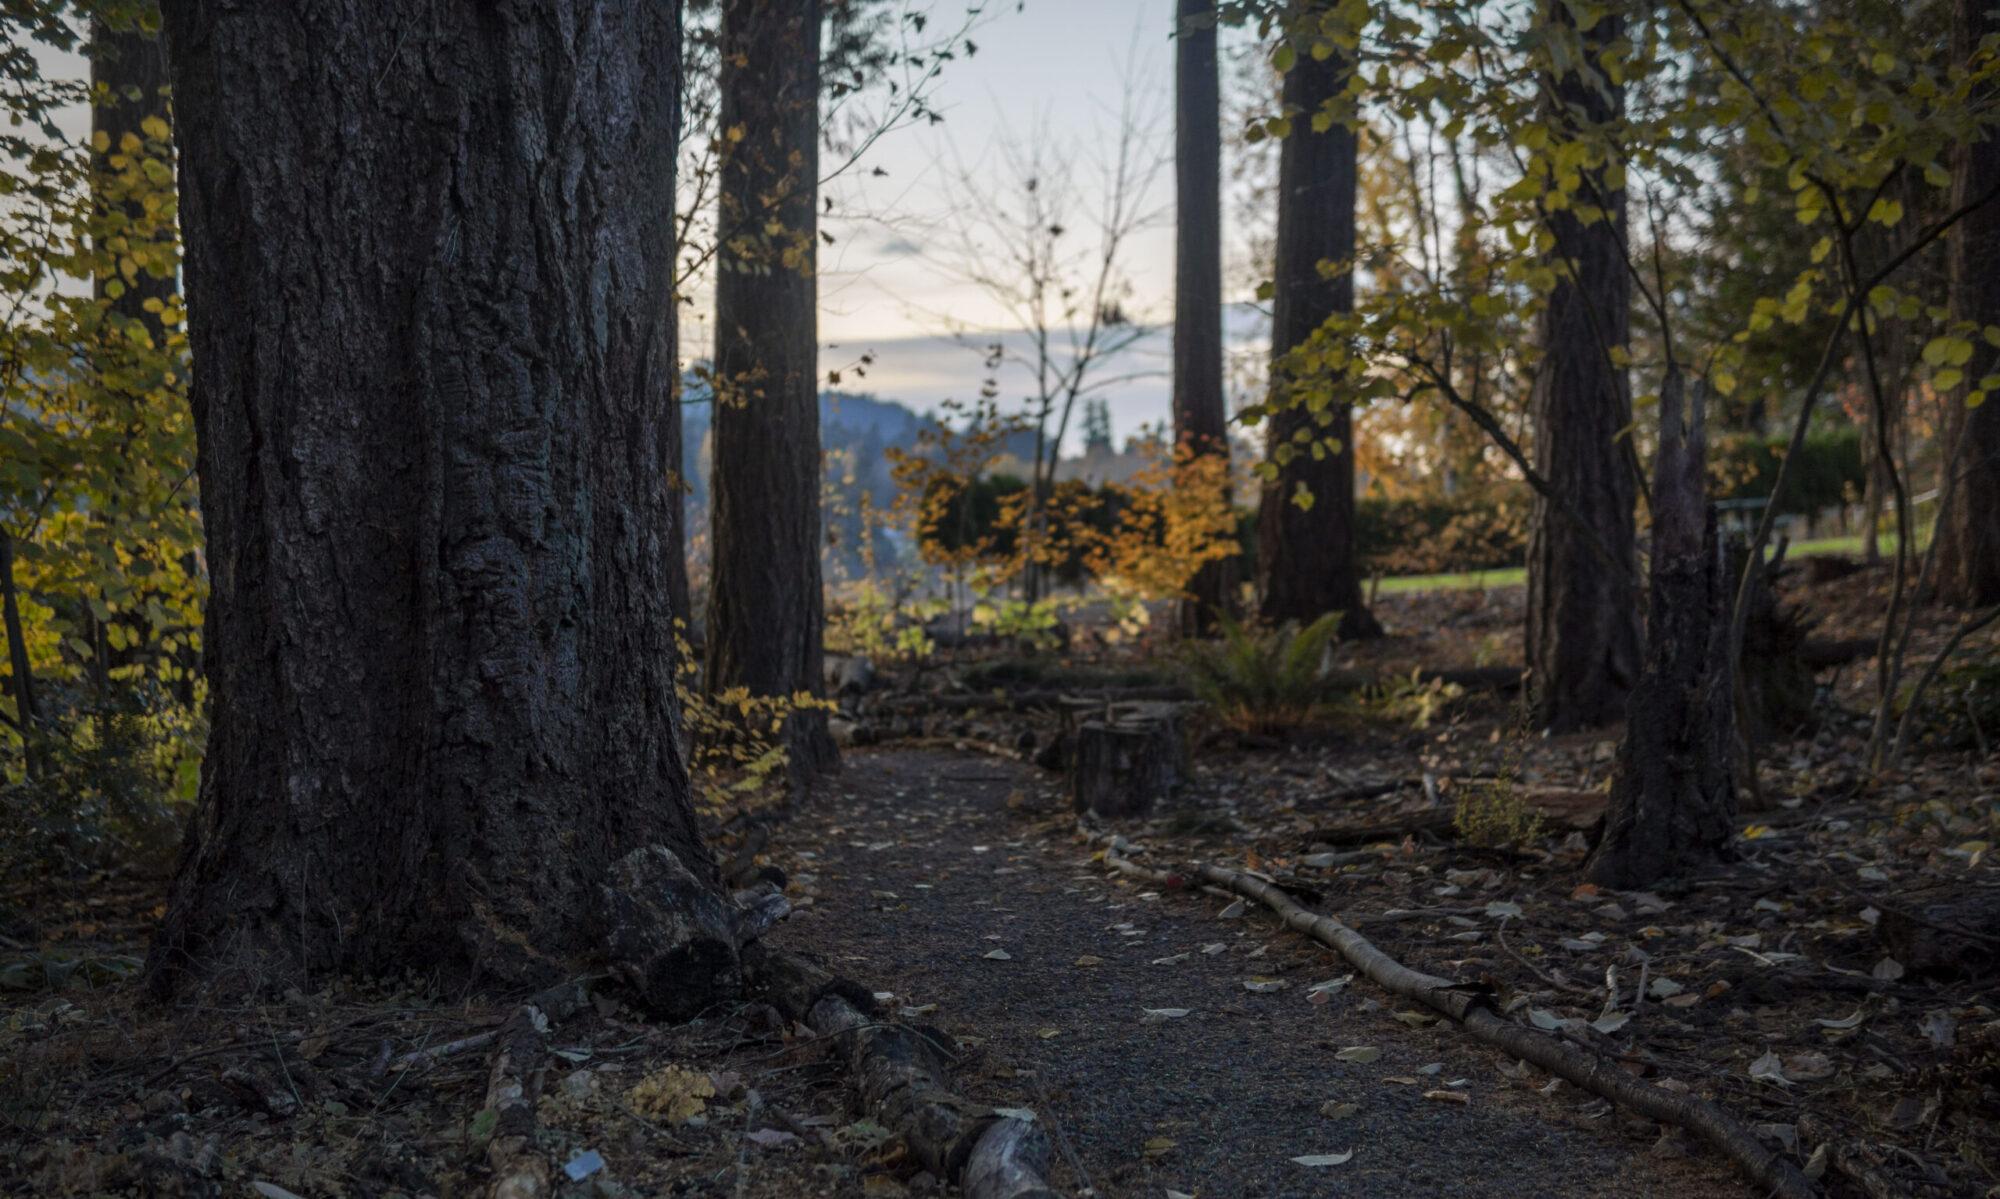 Homewoods on the Willamette